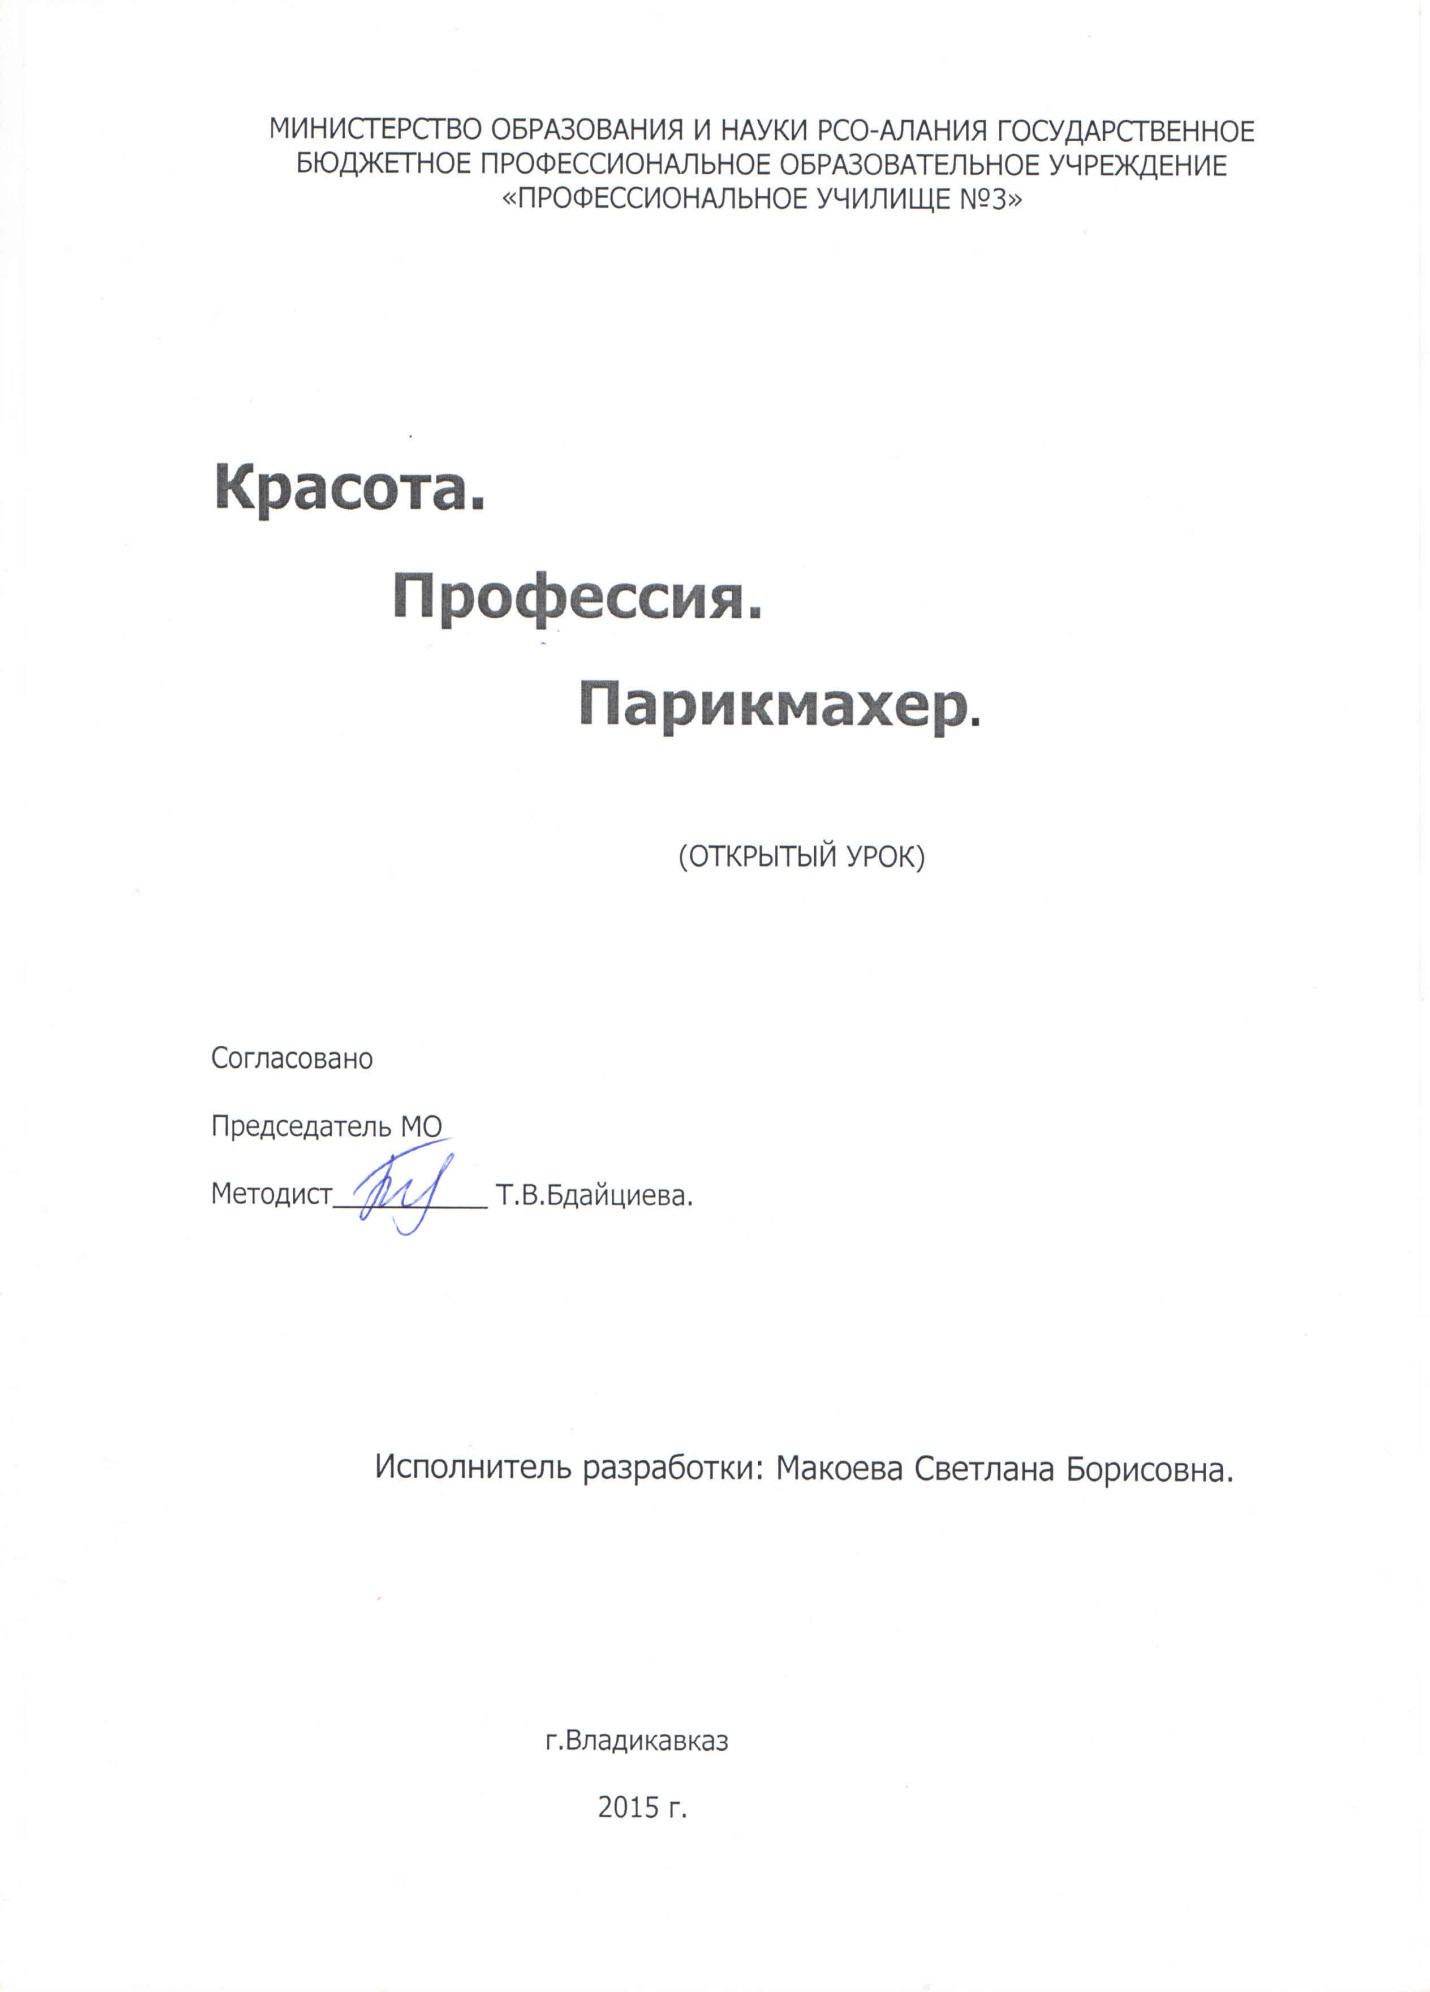 C:\Users\АМИНАТ\Documents\Документы сканера\Откр.ур.3.jpg